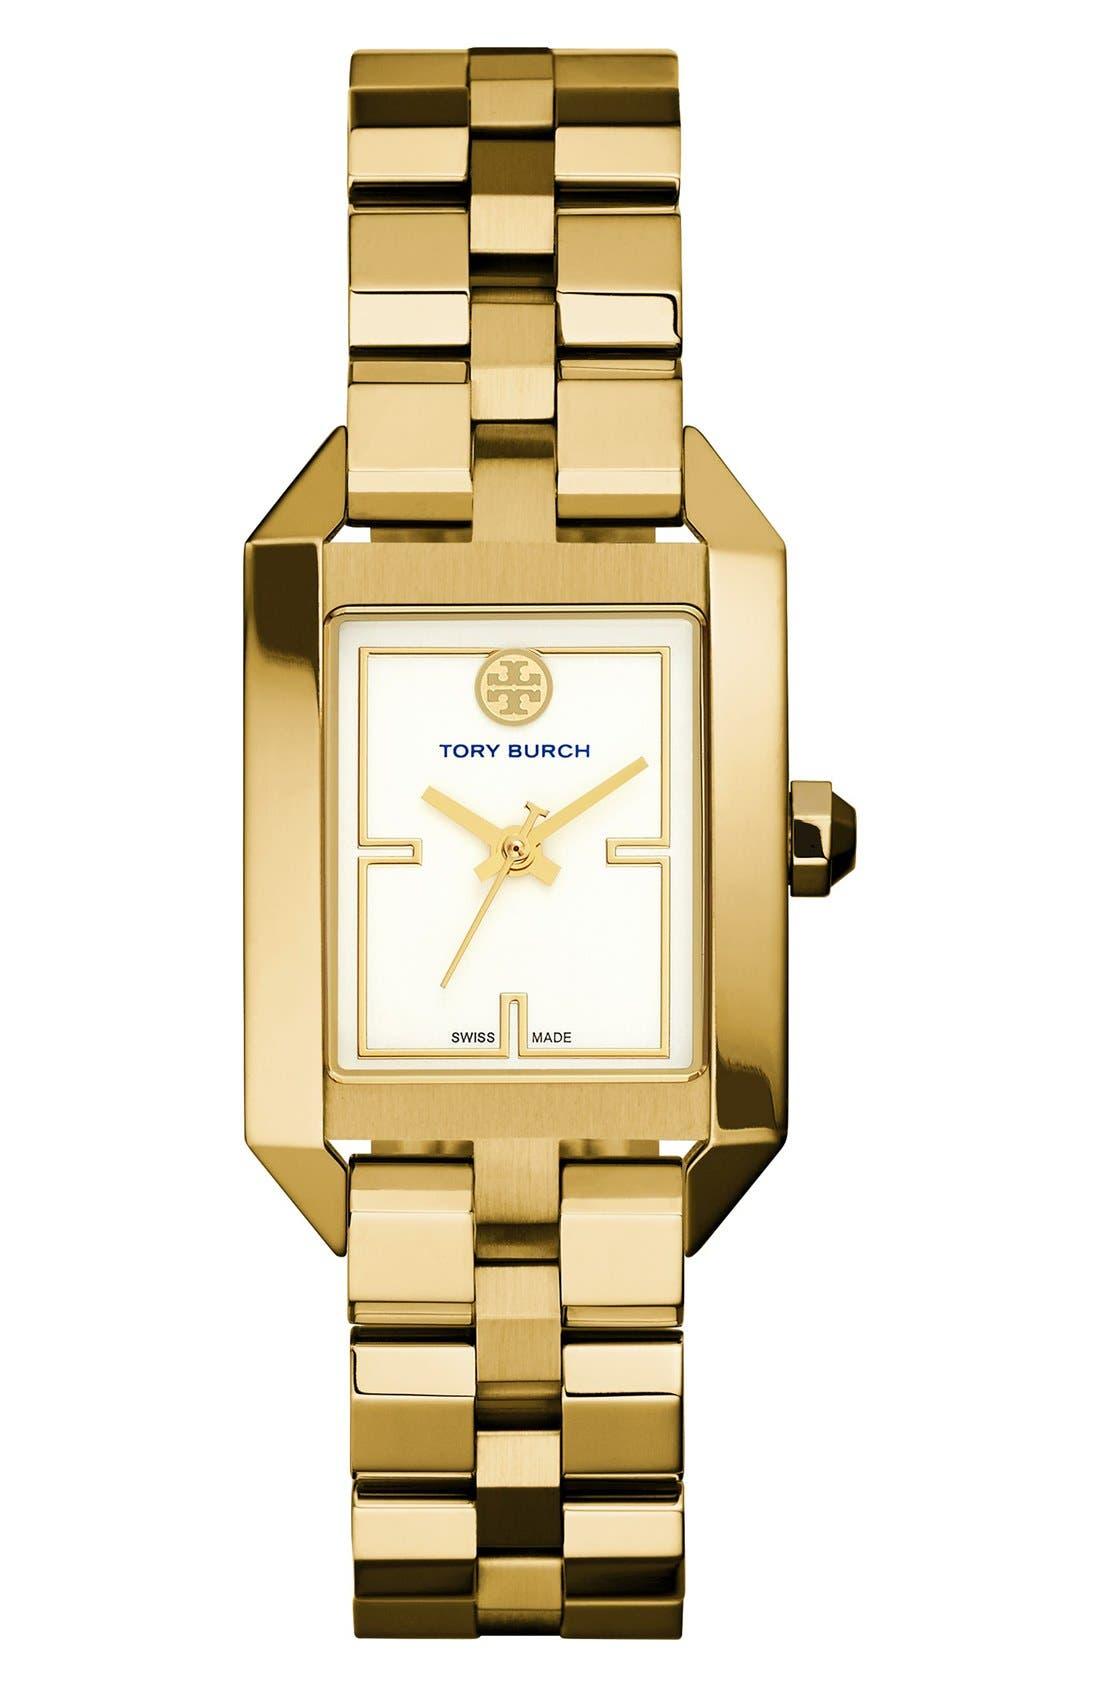 Alternate Image 1 Selected - Tory Burch 'Dalloway' Bracelet Watch, 23mm x 35mm